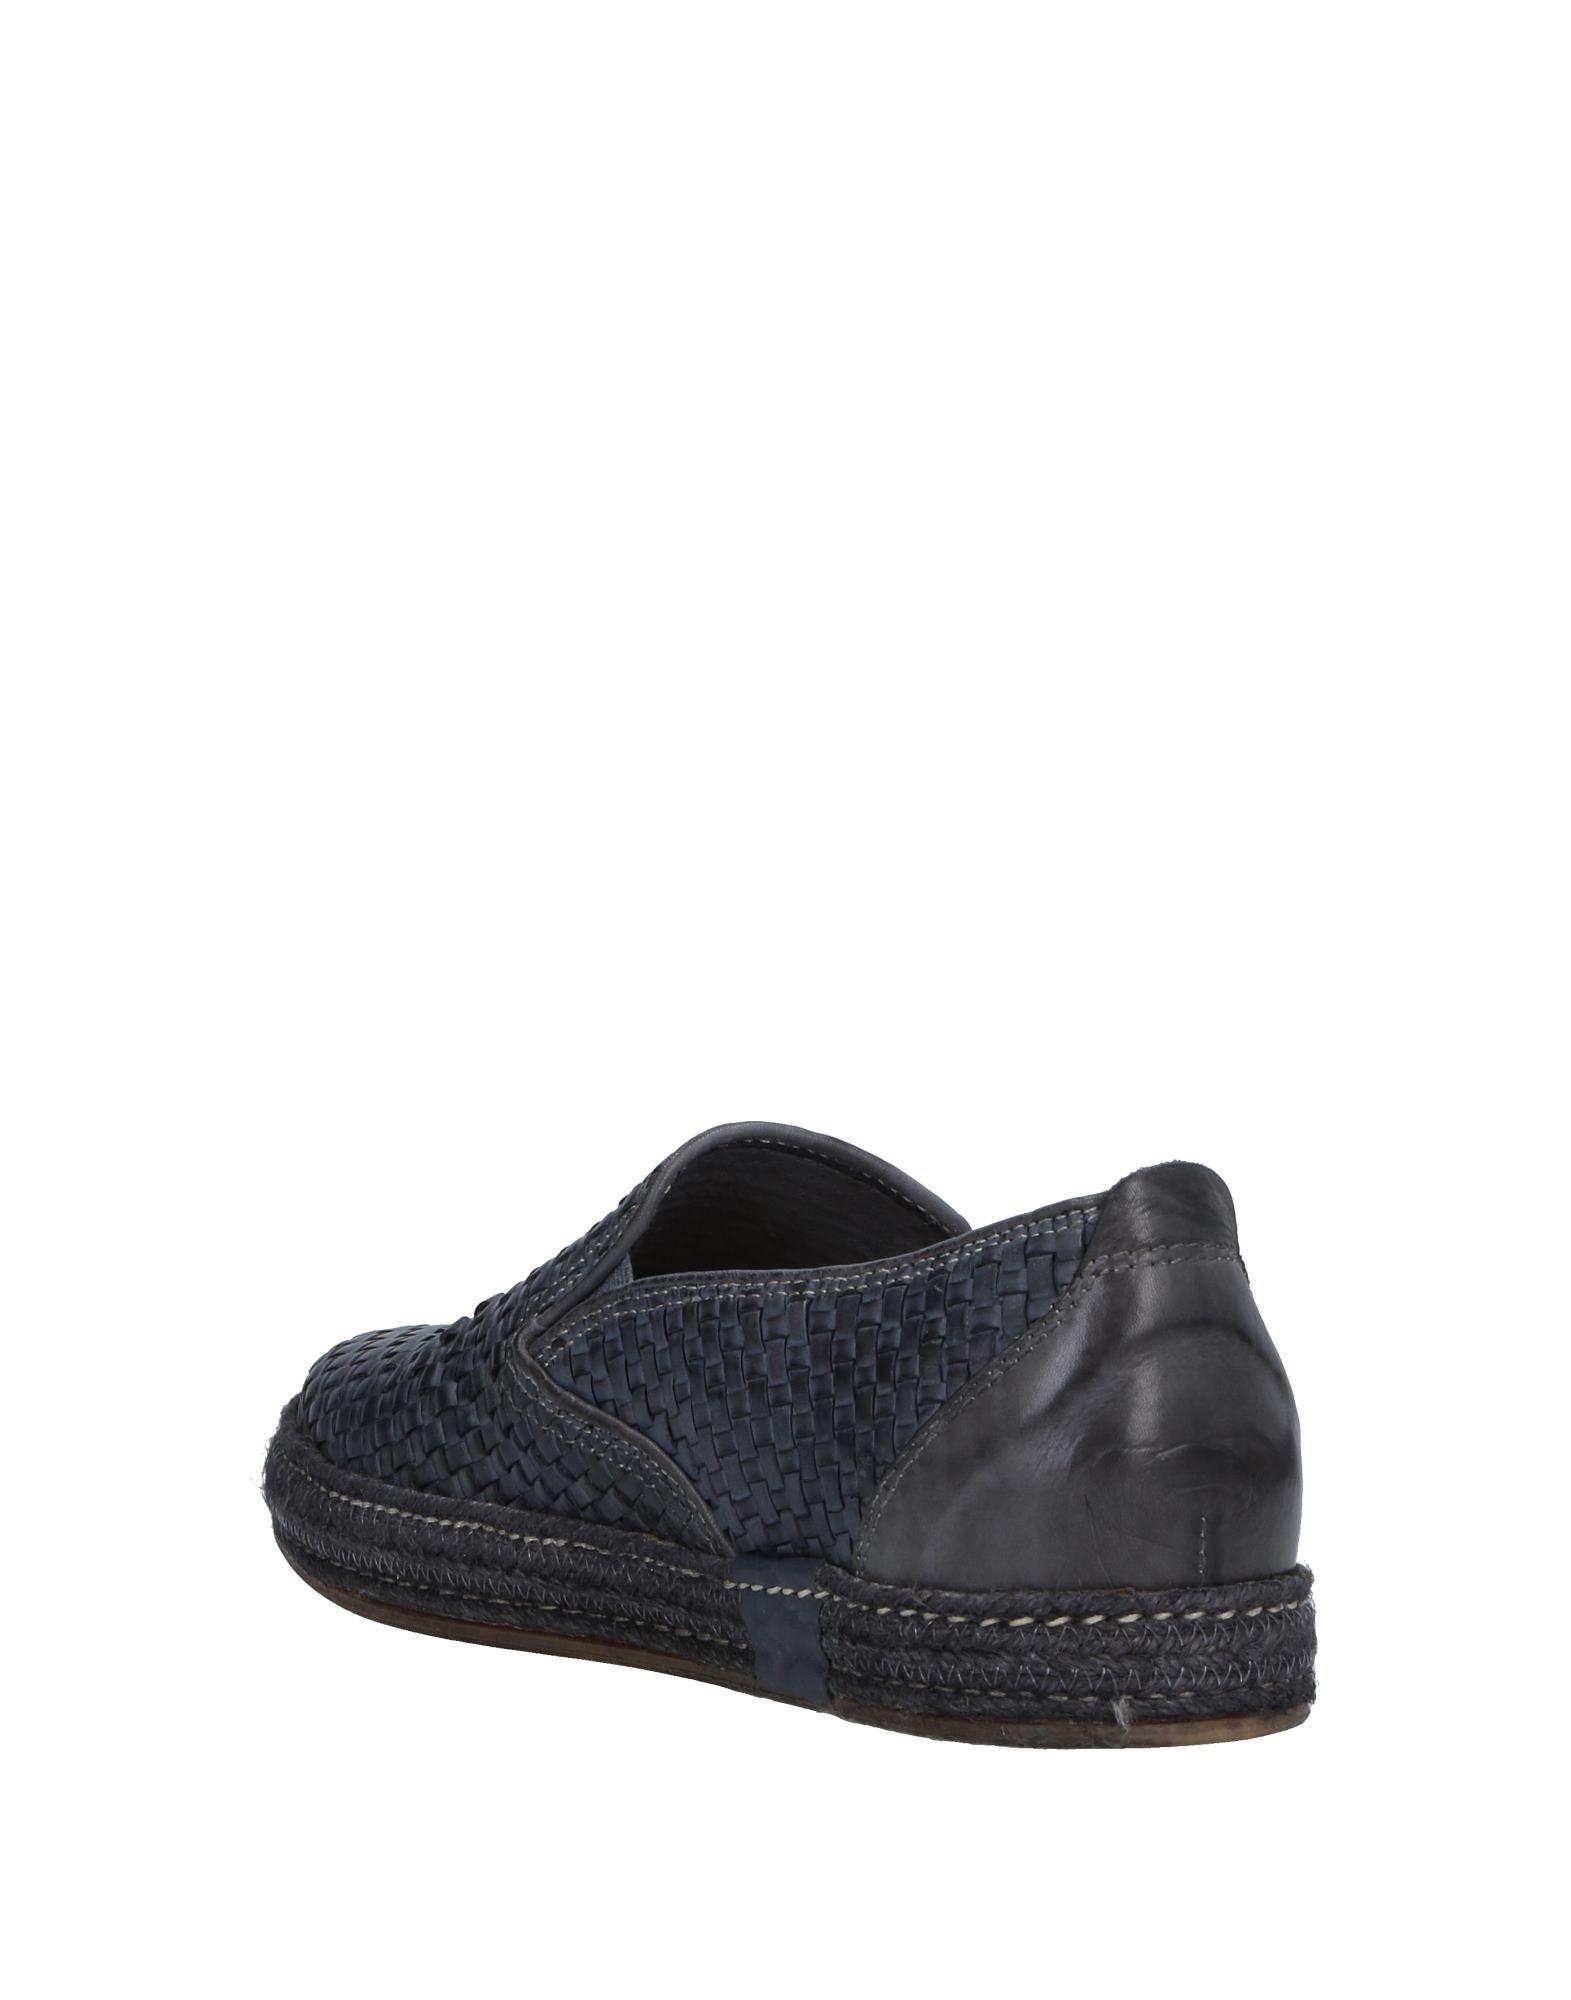 Schuhmann's Espadrilles Gute Herren  11533122HI Gute Espadrilles Qualität beliebte Schuhe 61c340